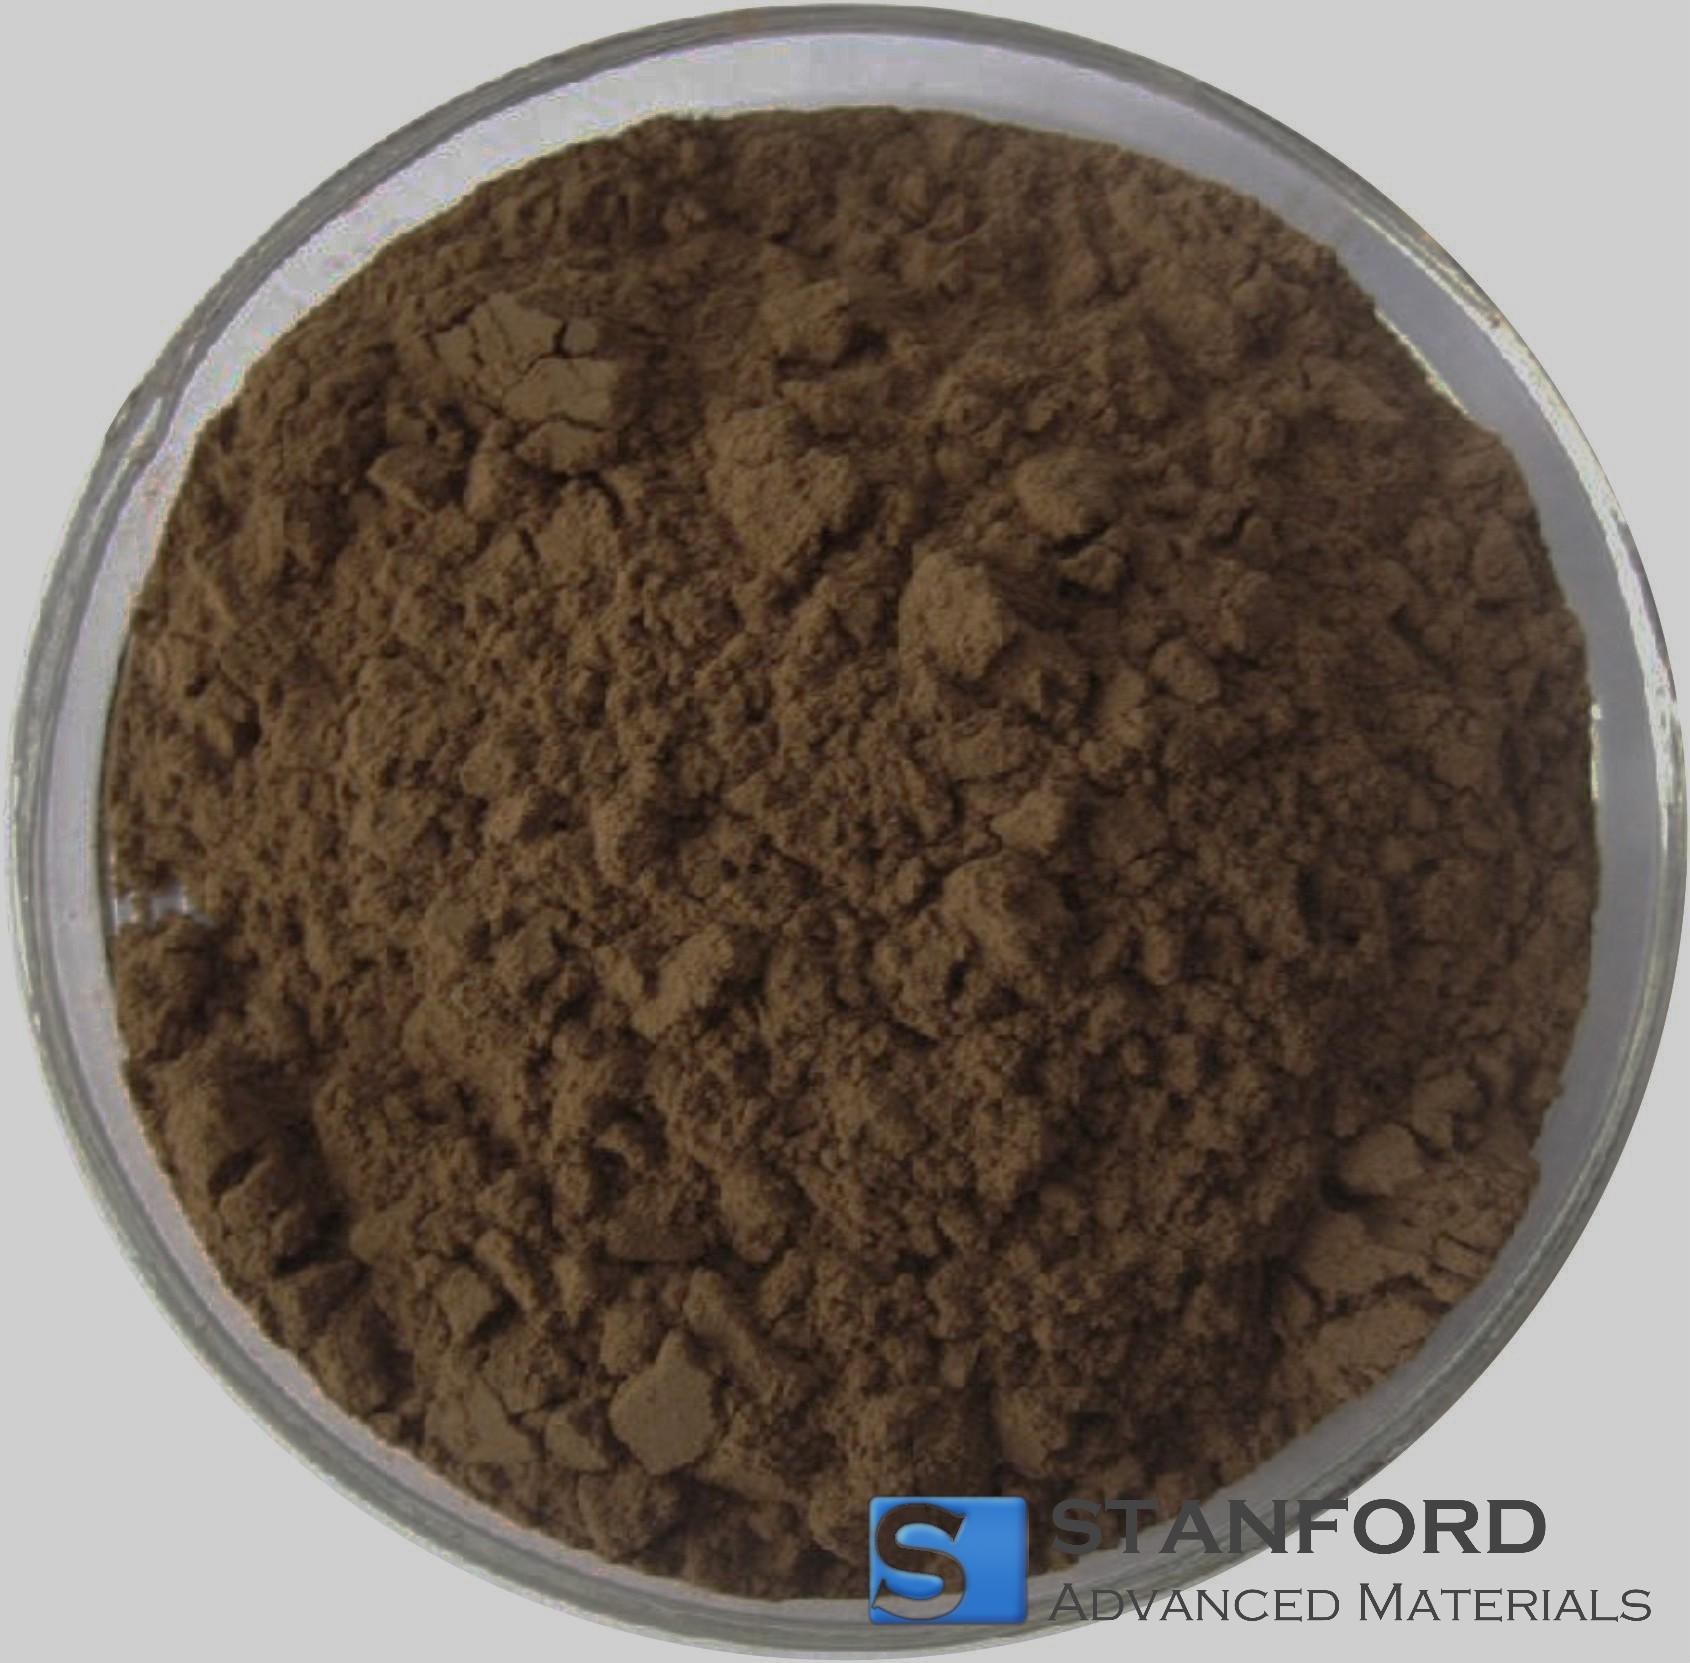 PT2007 Platinum (II) Chloride Powder